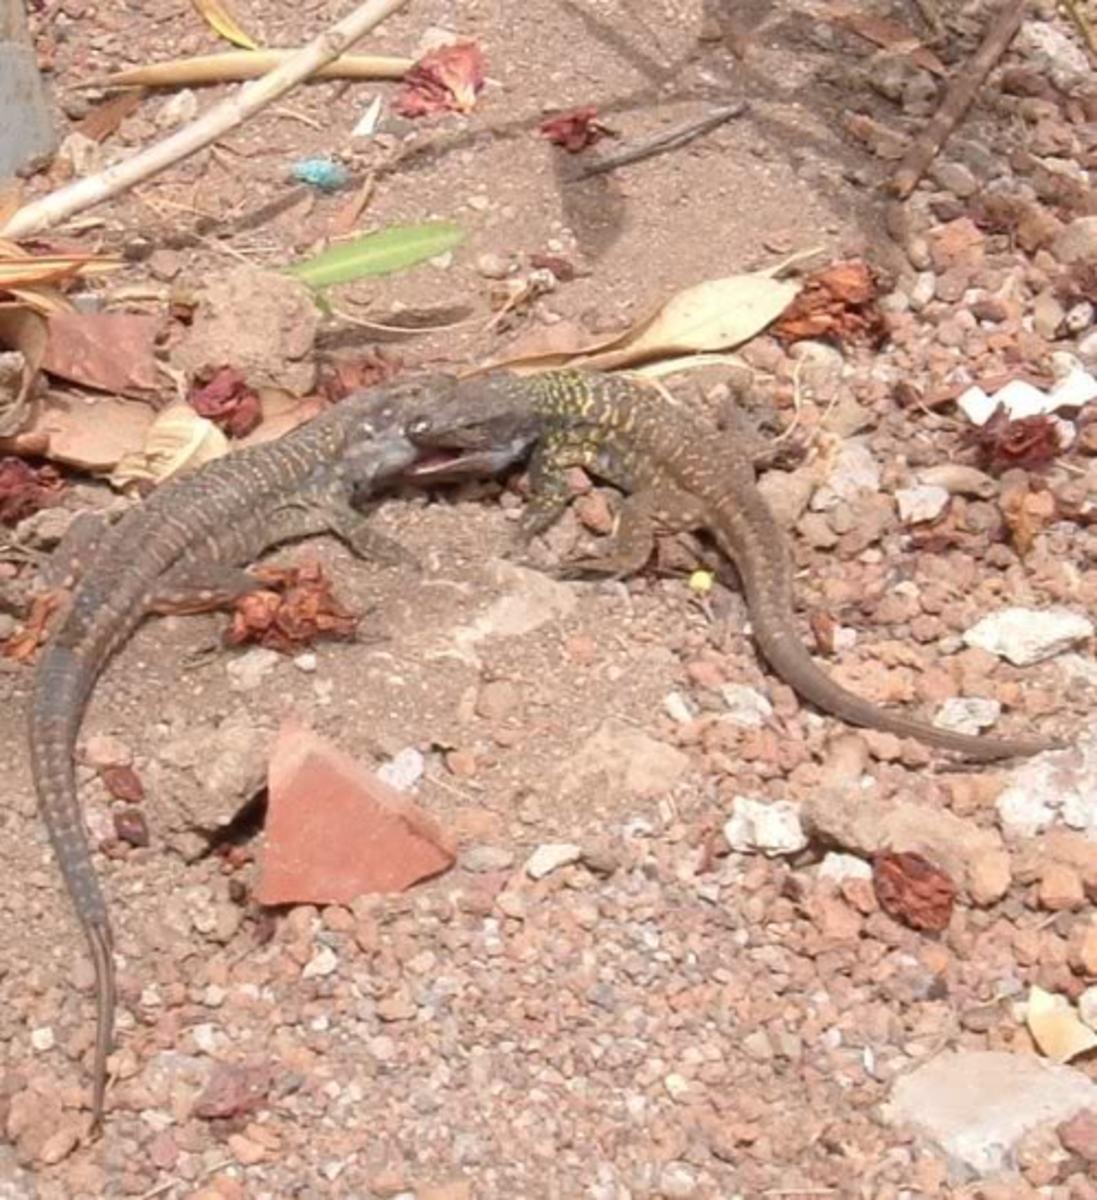 Tenerife Lizard males fighting